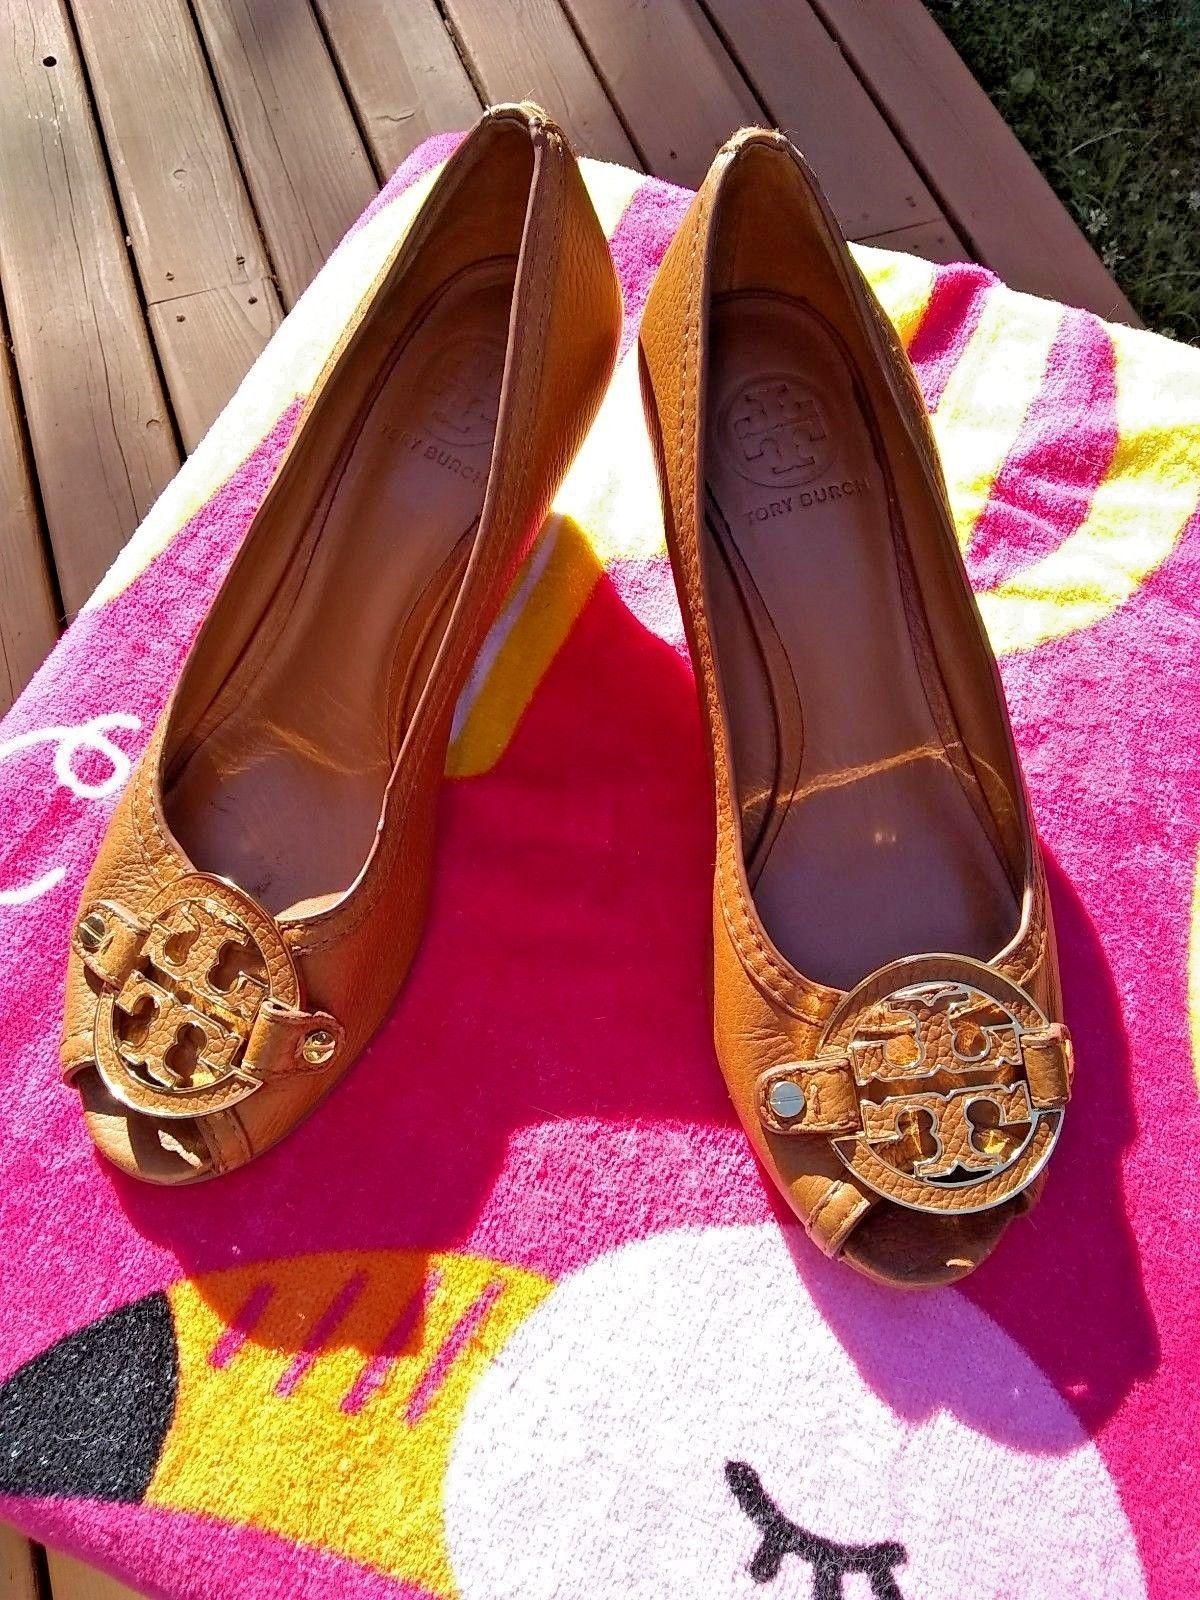 bfc71924b TORY BURCH Sally 2 Peep Toe Wedge Heels Tan Gold Shoes 8.5 M ...